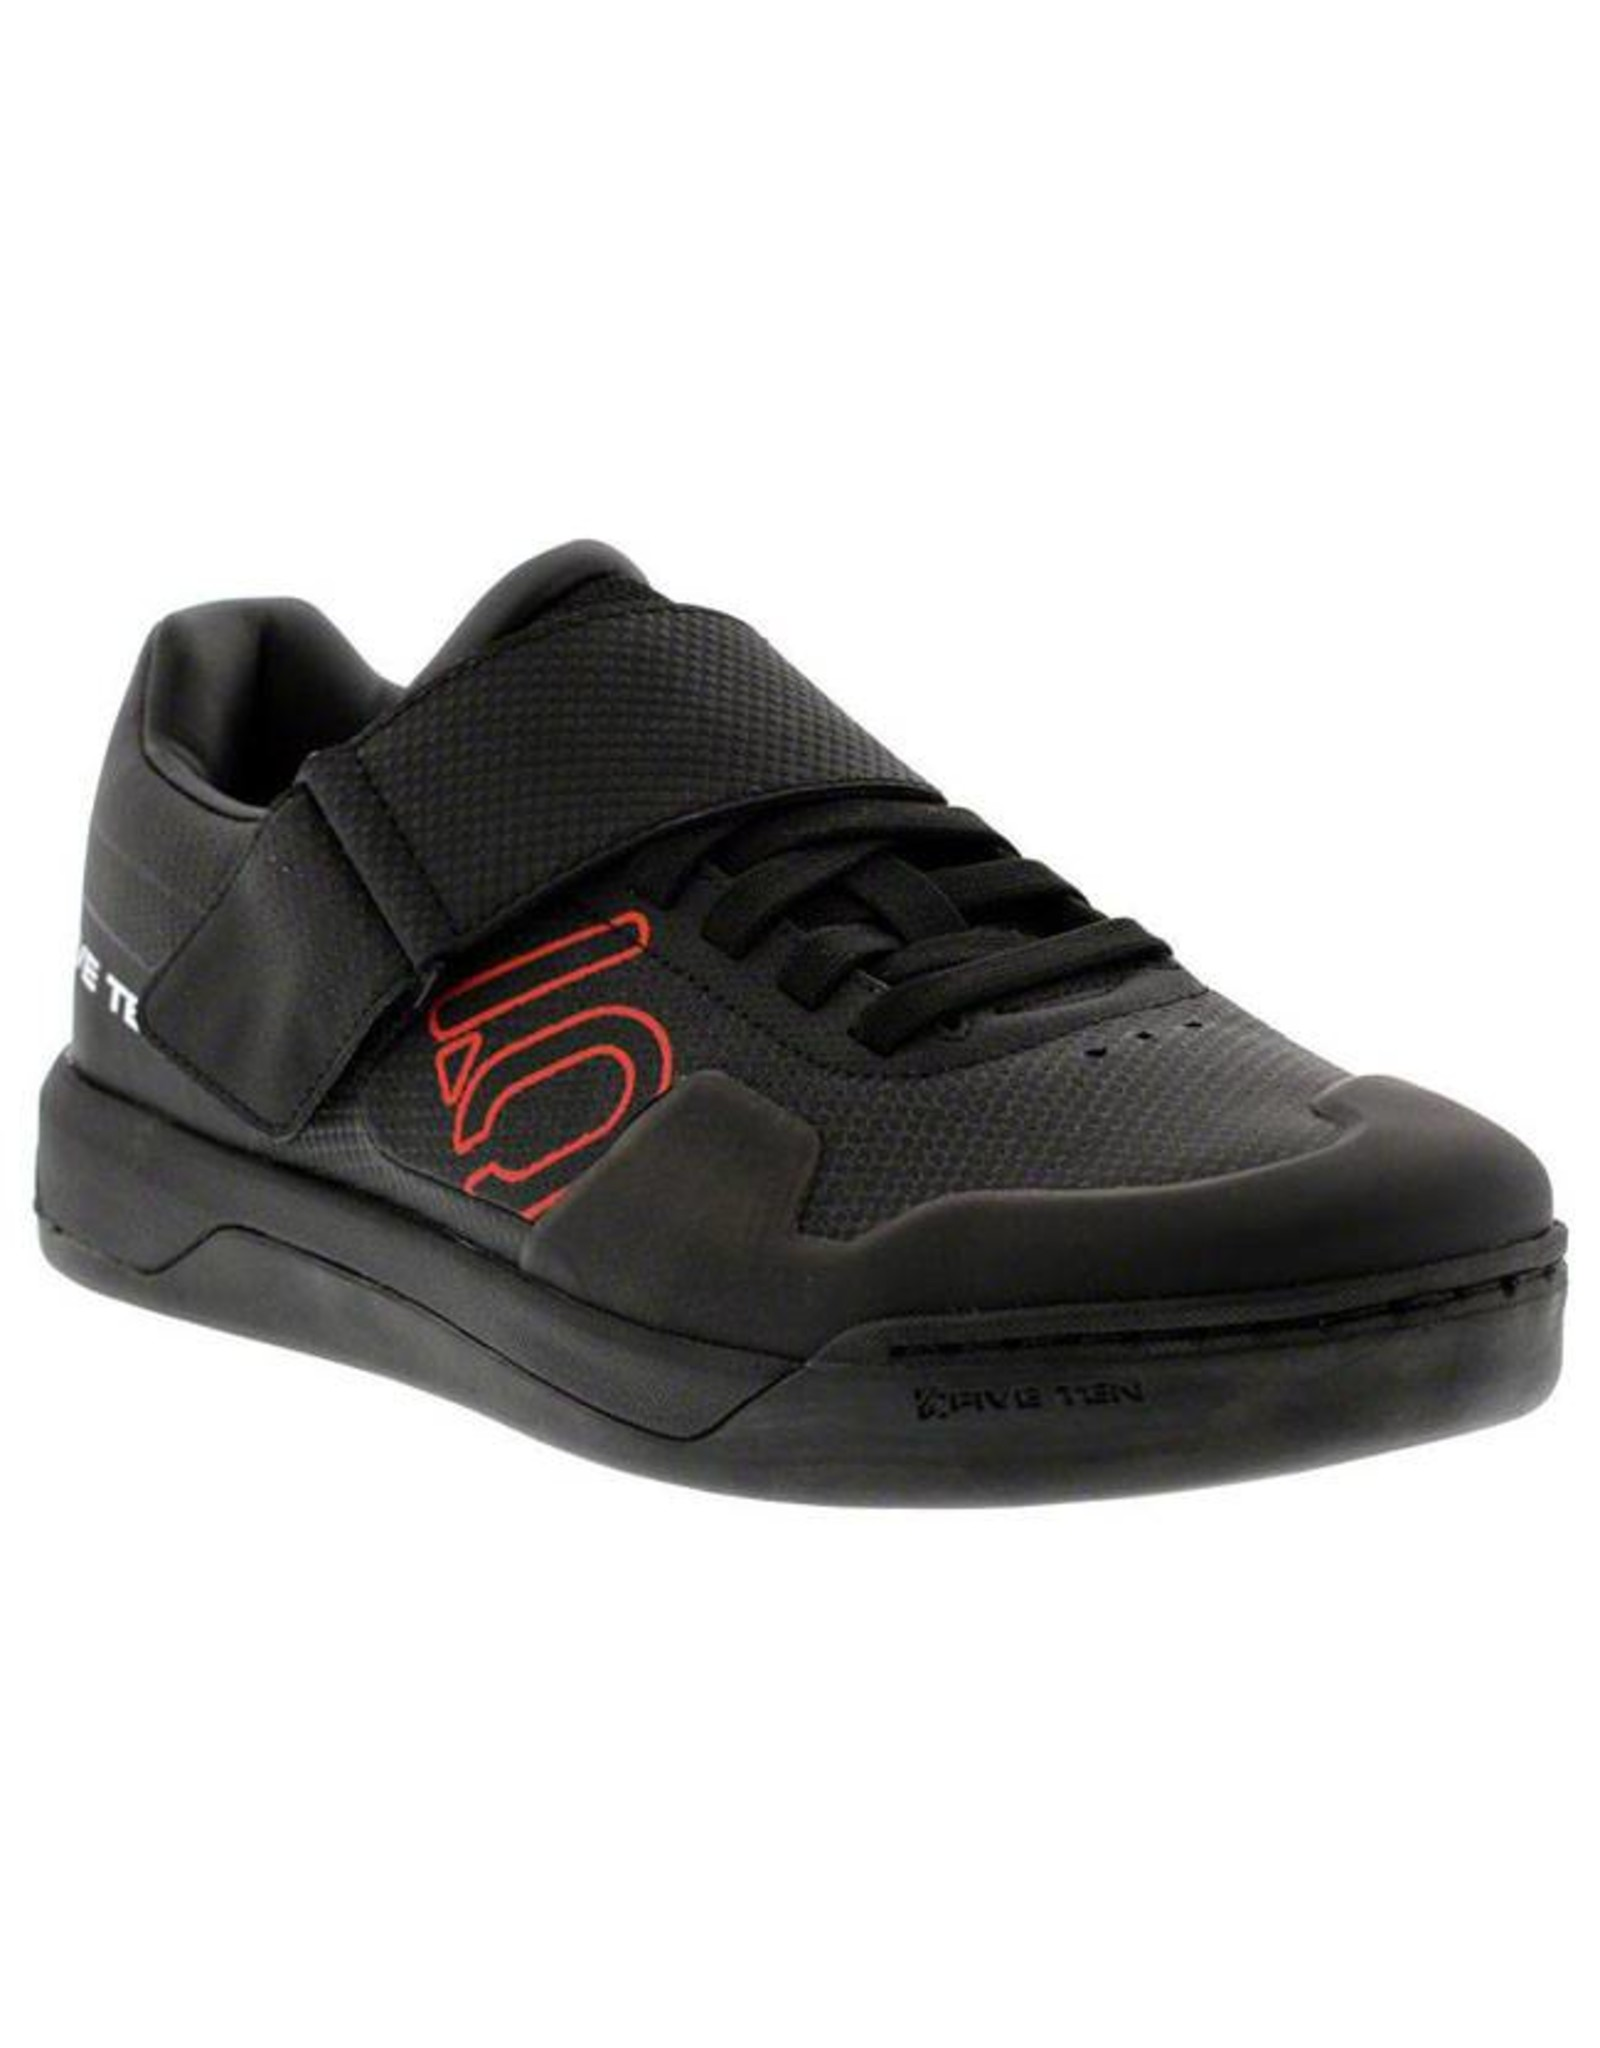 Five Ten Five Ten Hellcat Pro Men's Clipless/Flat Pedal Shoe: Black 10